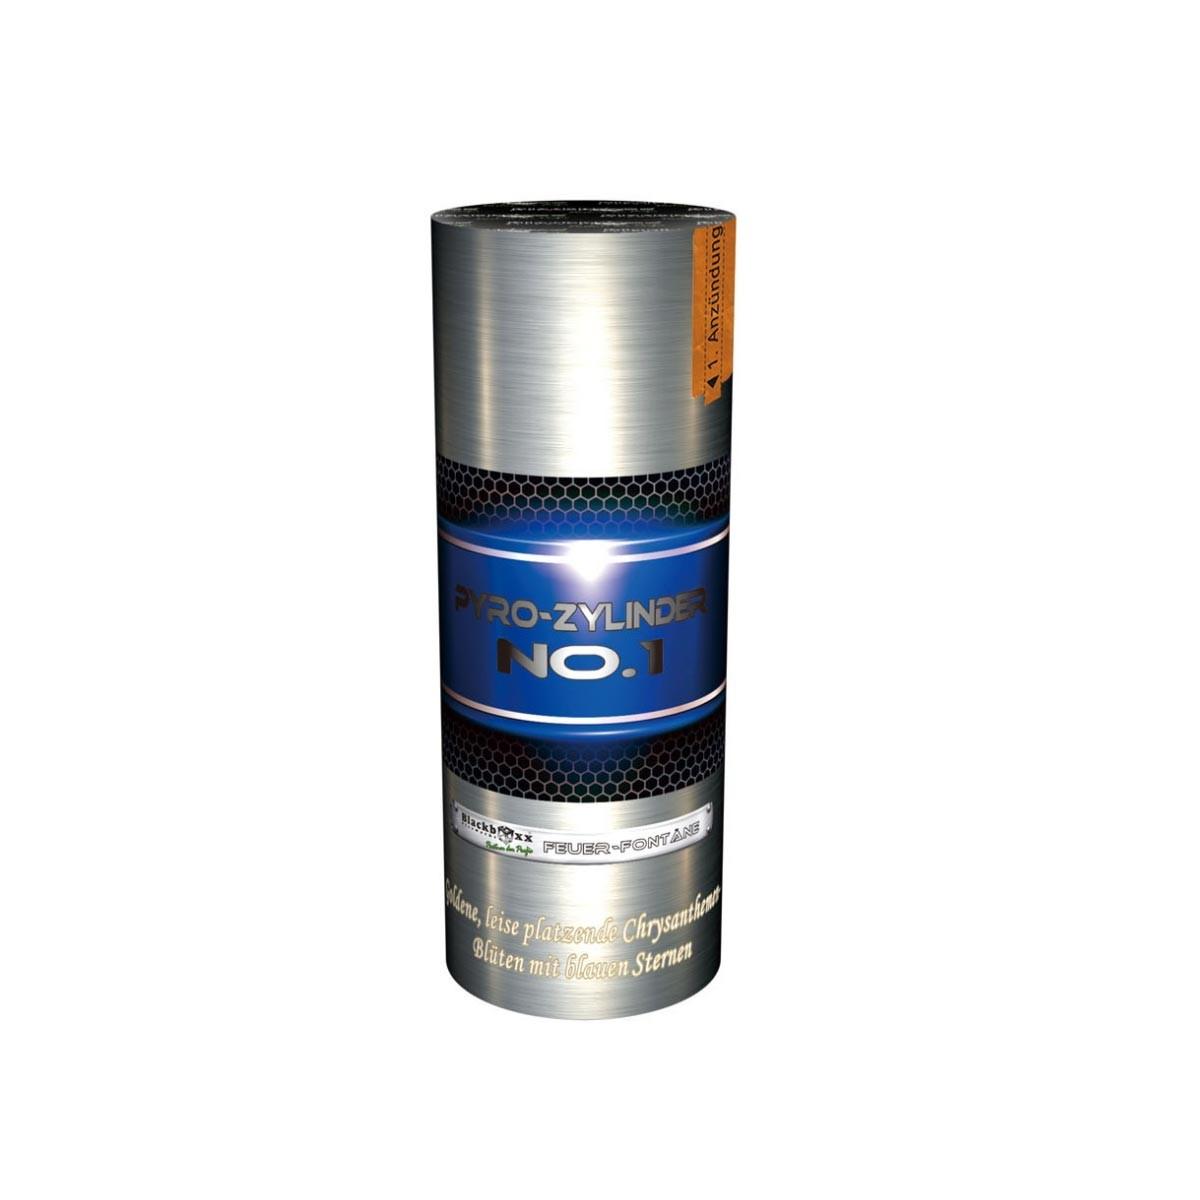 Pyro-Zylinder No.1